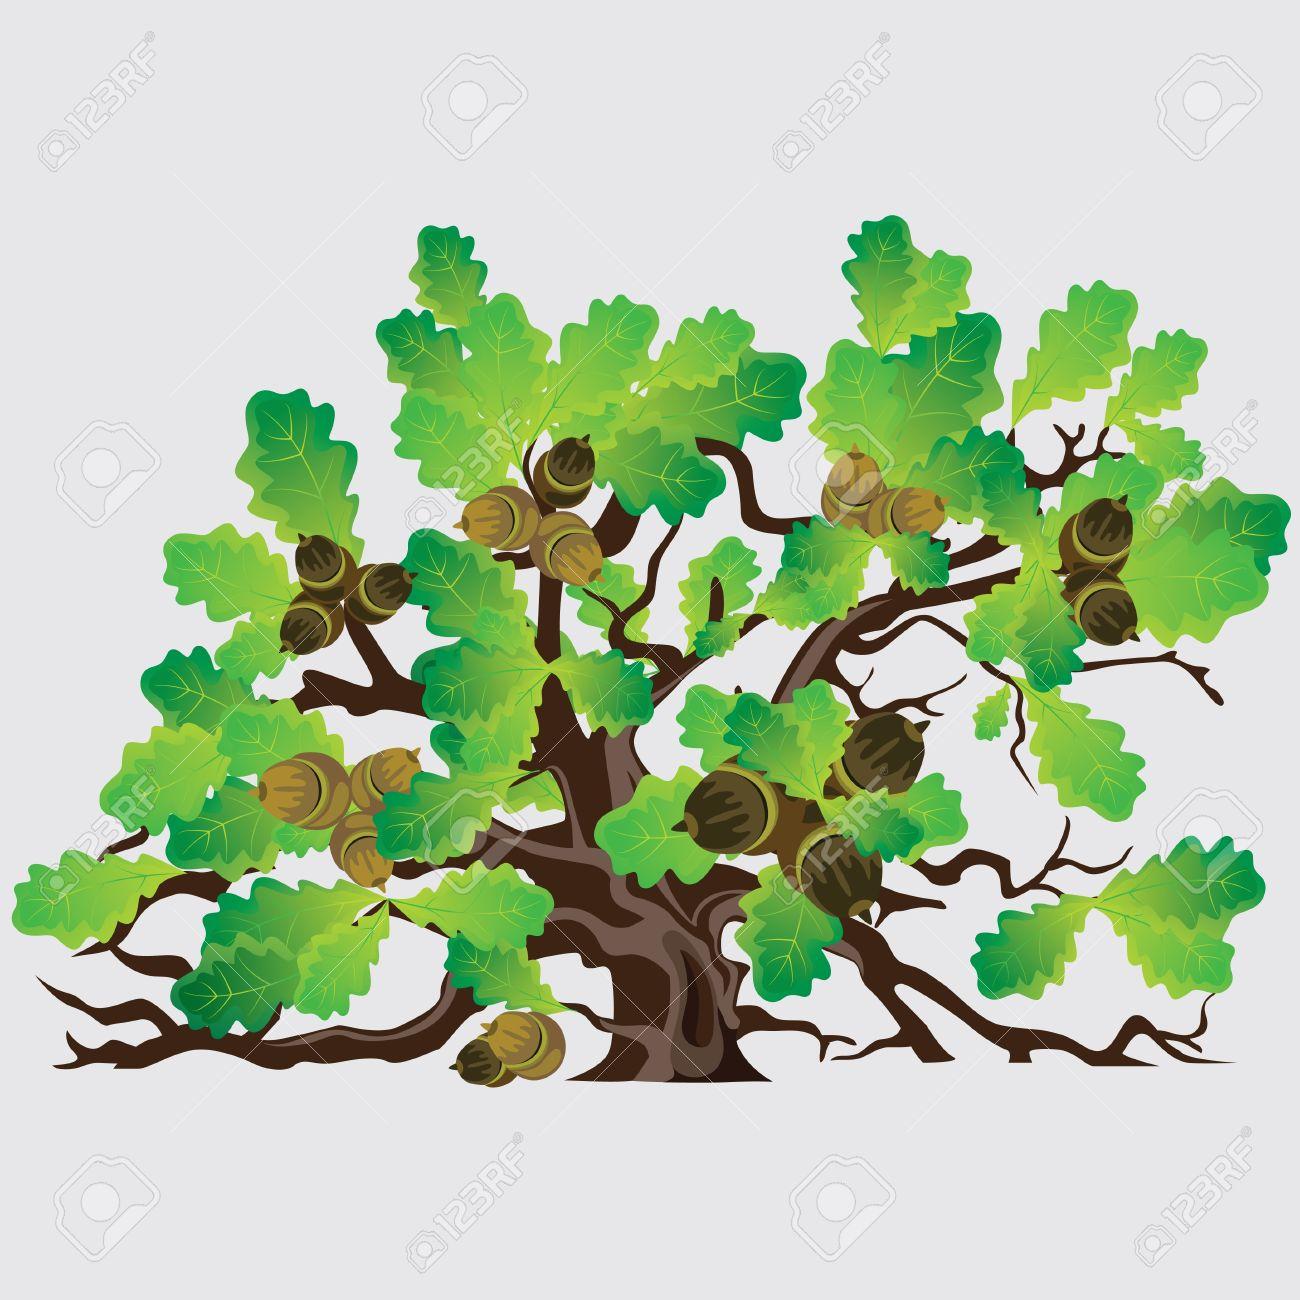 Big Green Oak Tree With Acorns Vector Illustration Royalty Free.